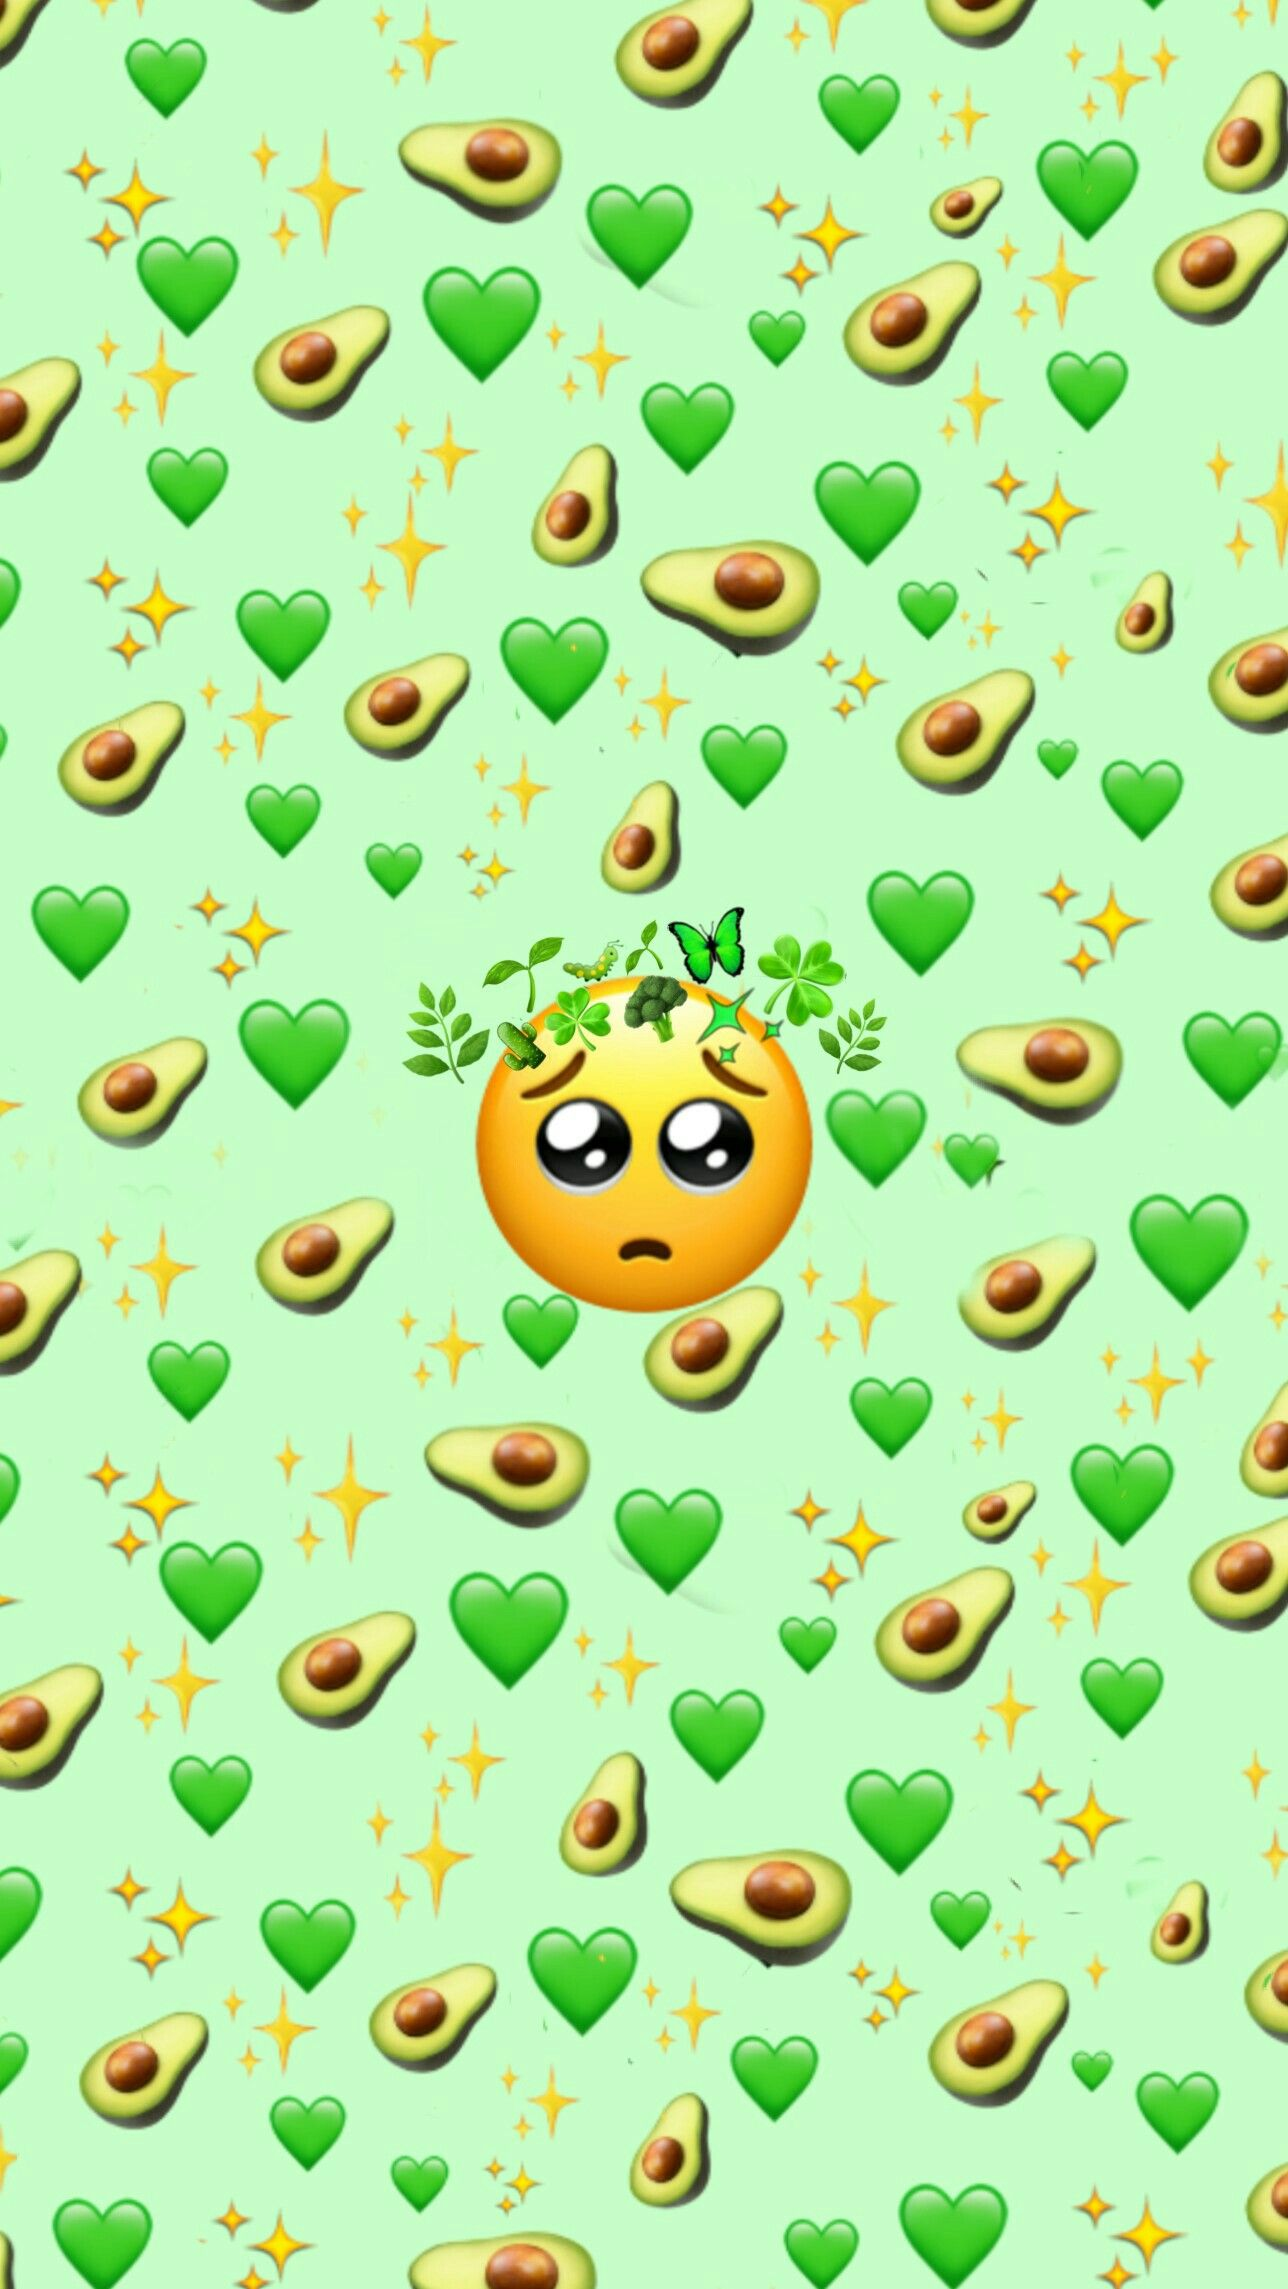 Free download Green Emoji background Emoji wallpaper Emoji ...